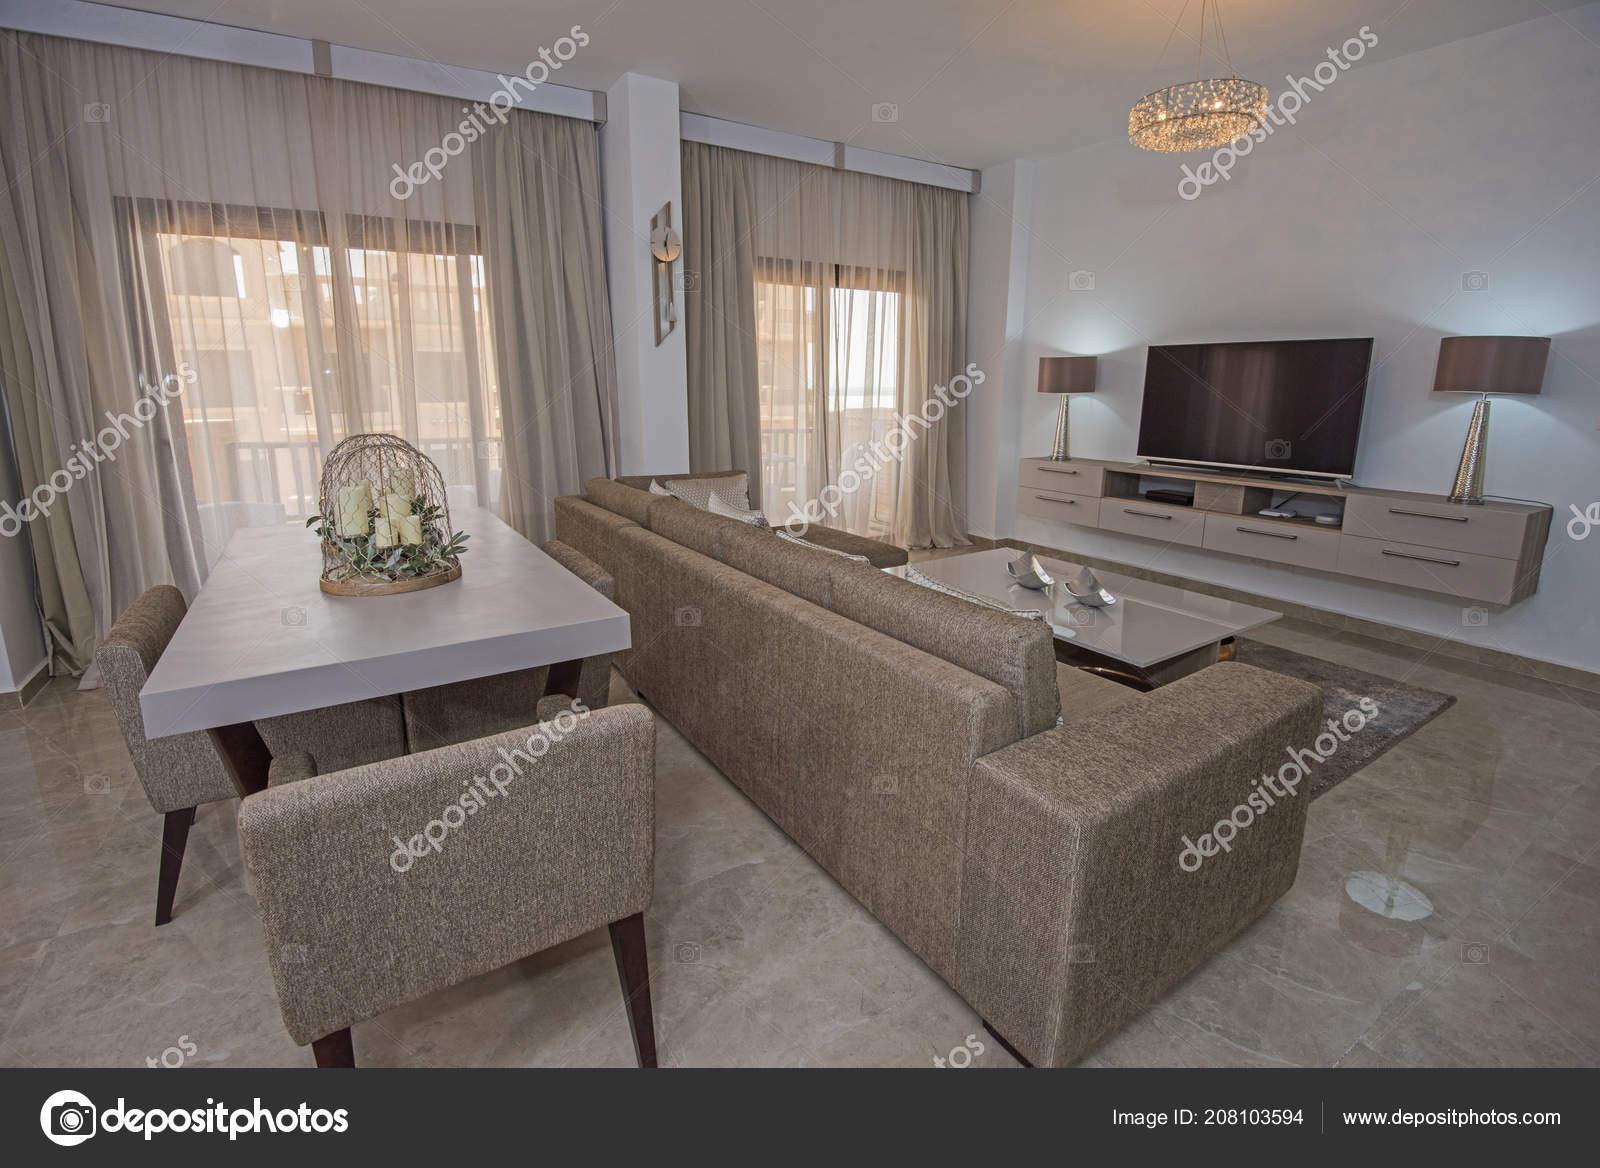 Sala Lounge Con Mesa Comedor Diseño Interiores Decoración Decoración ...